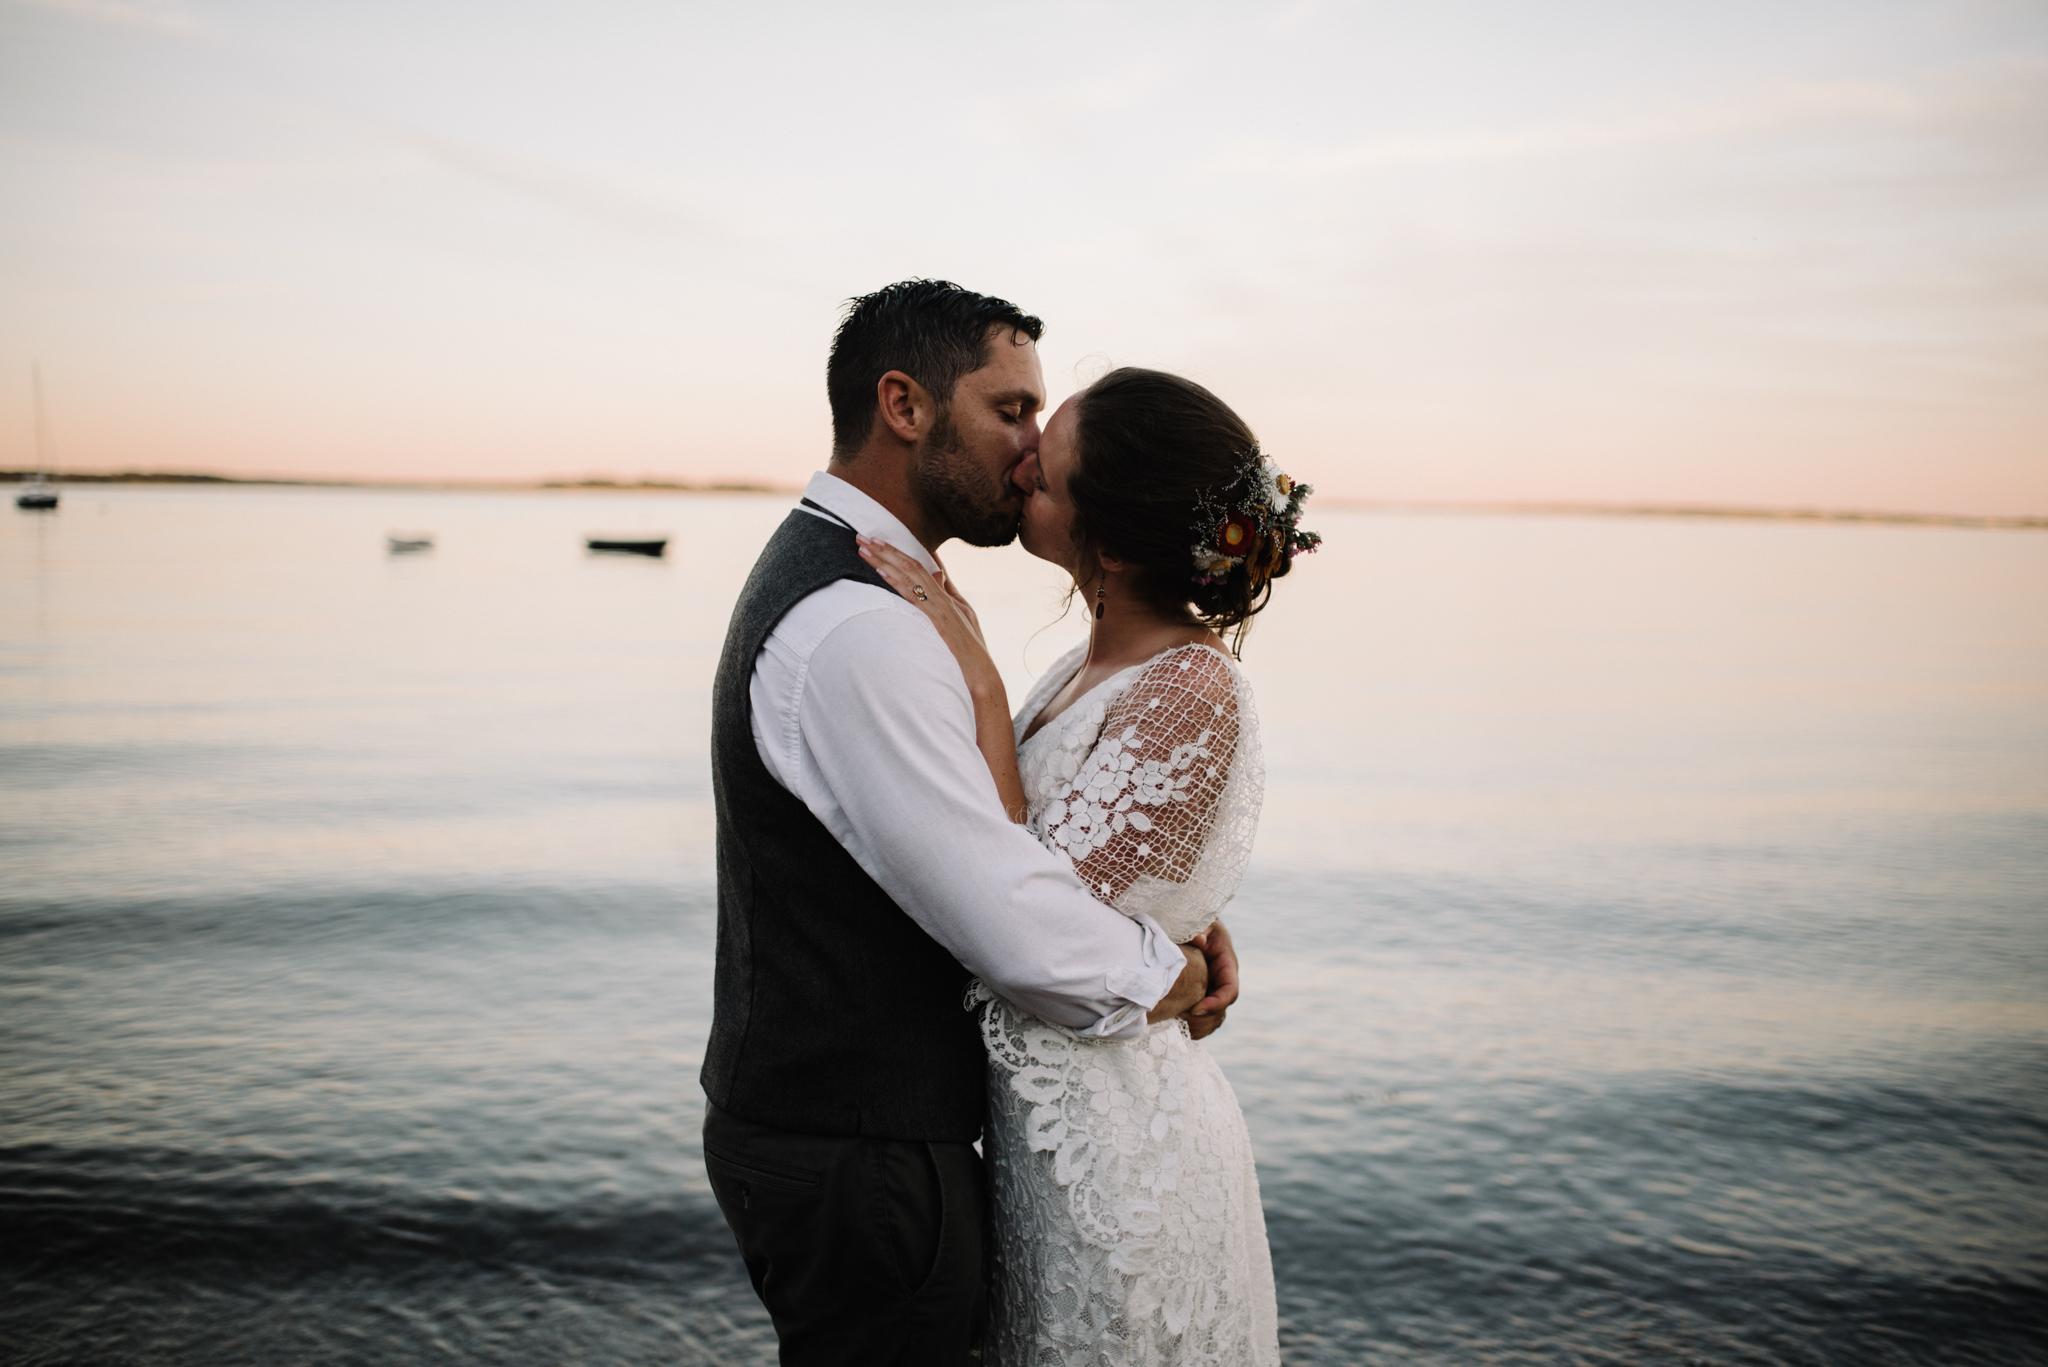 Damian and Jesse Chebeague Island Maine Backyard Destination Beach Wedding White Sails Creative_28.JPG